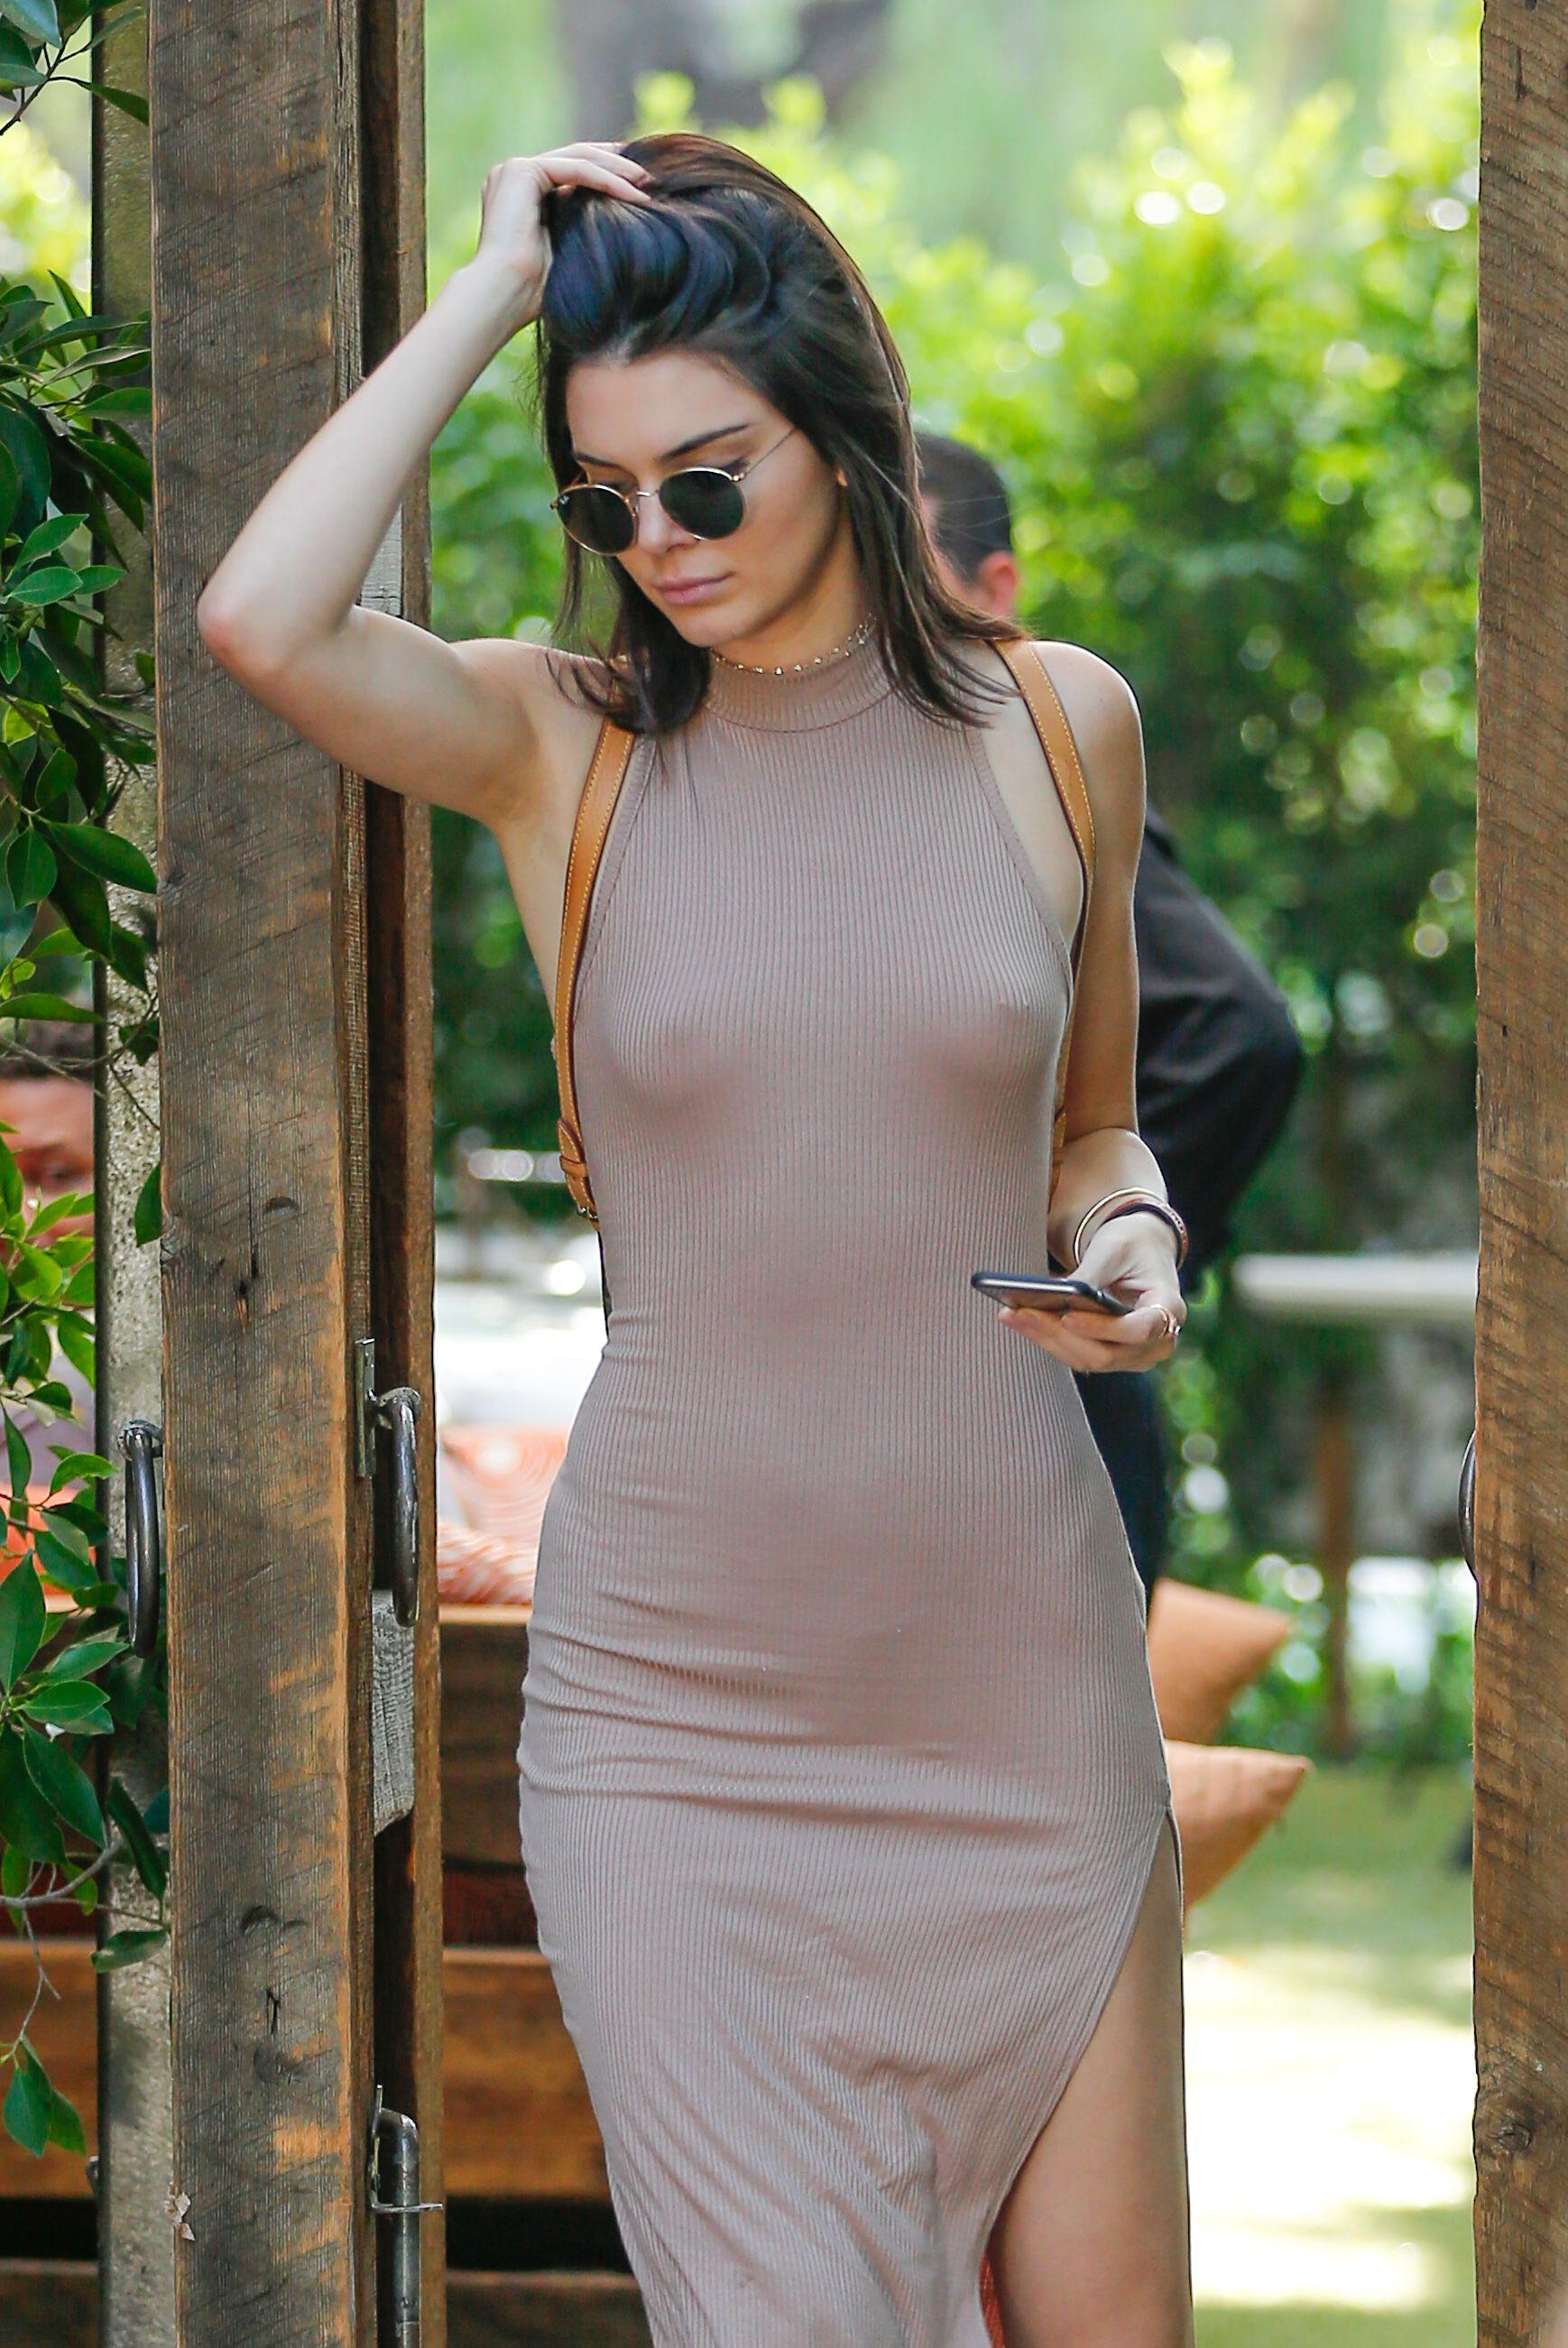 Kendall Jenner Braless 1 Sn4933